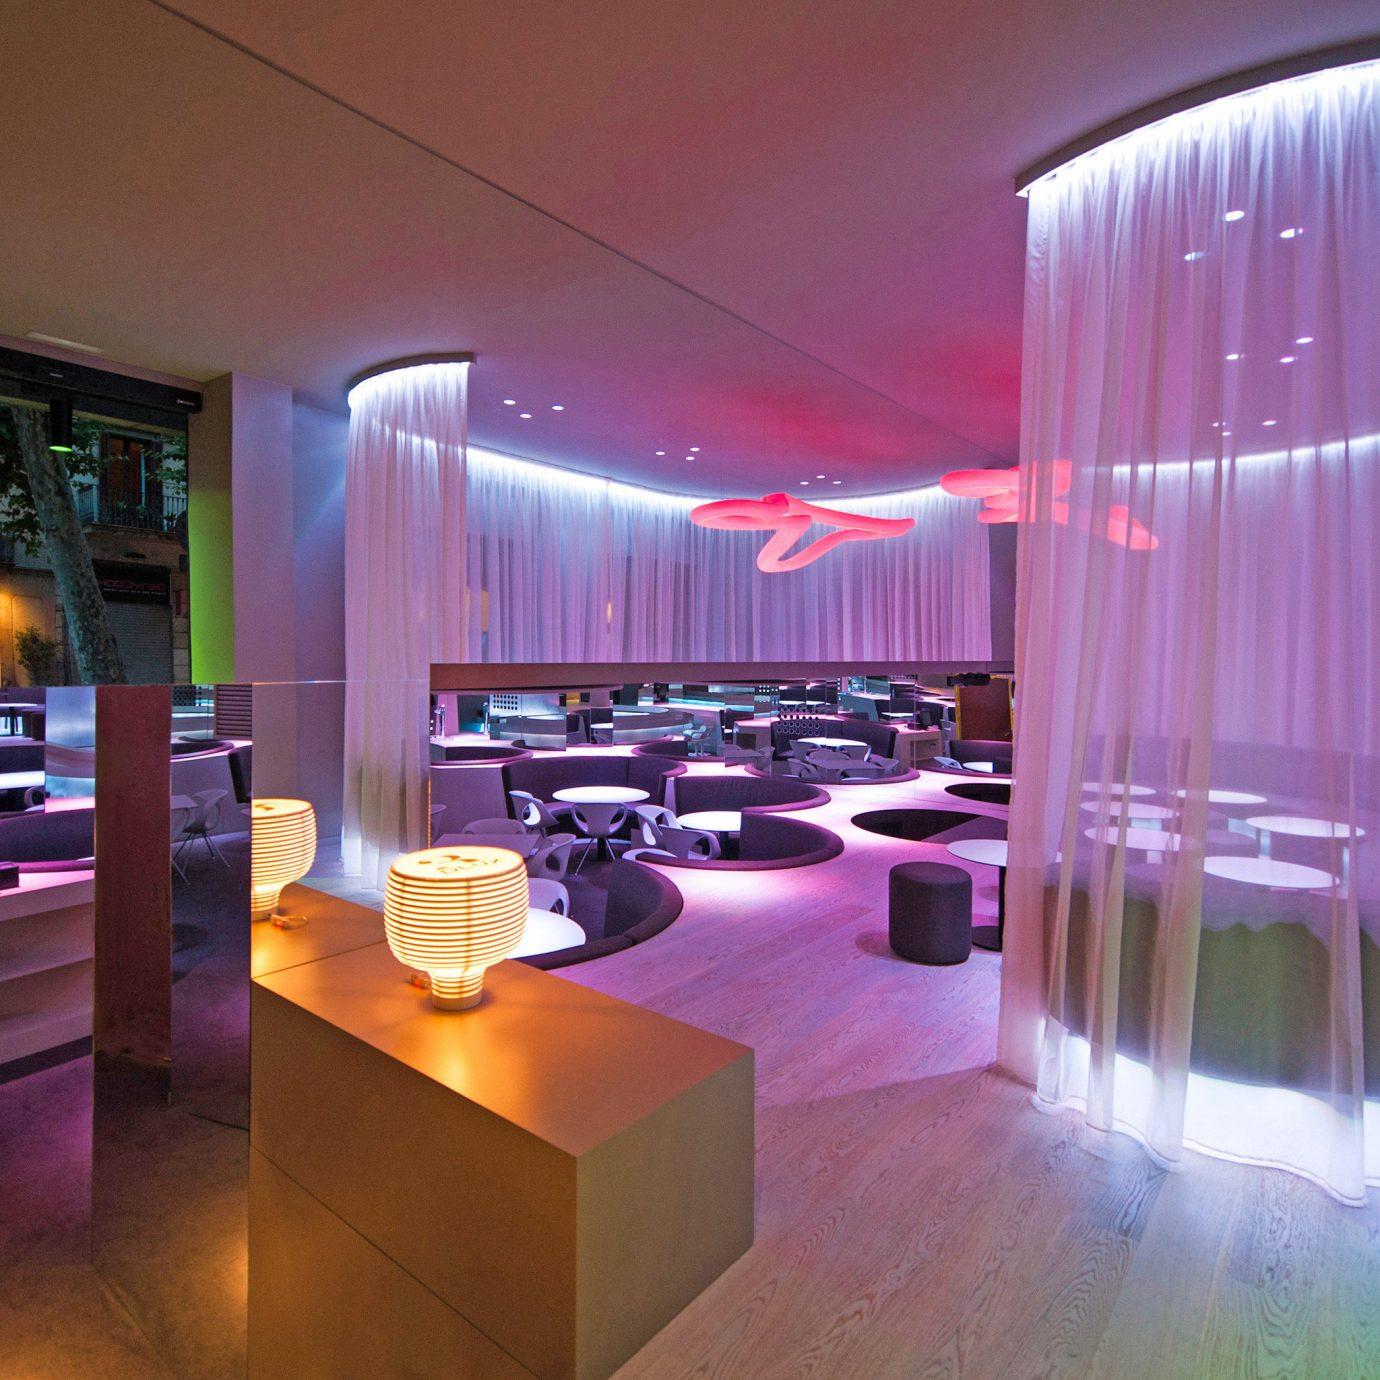 Adult-only City Hip Lounge Nightlife Play restaurant function hall Bar nightclub